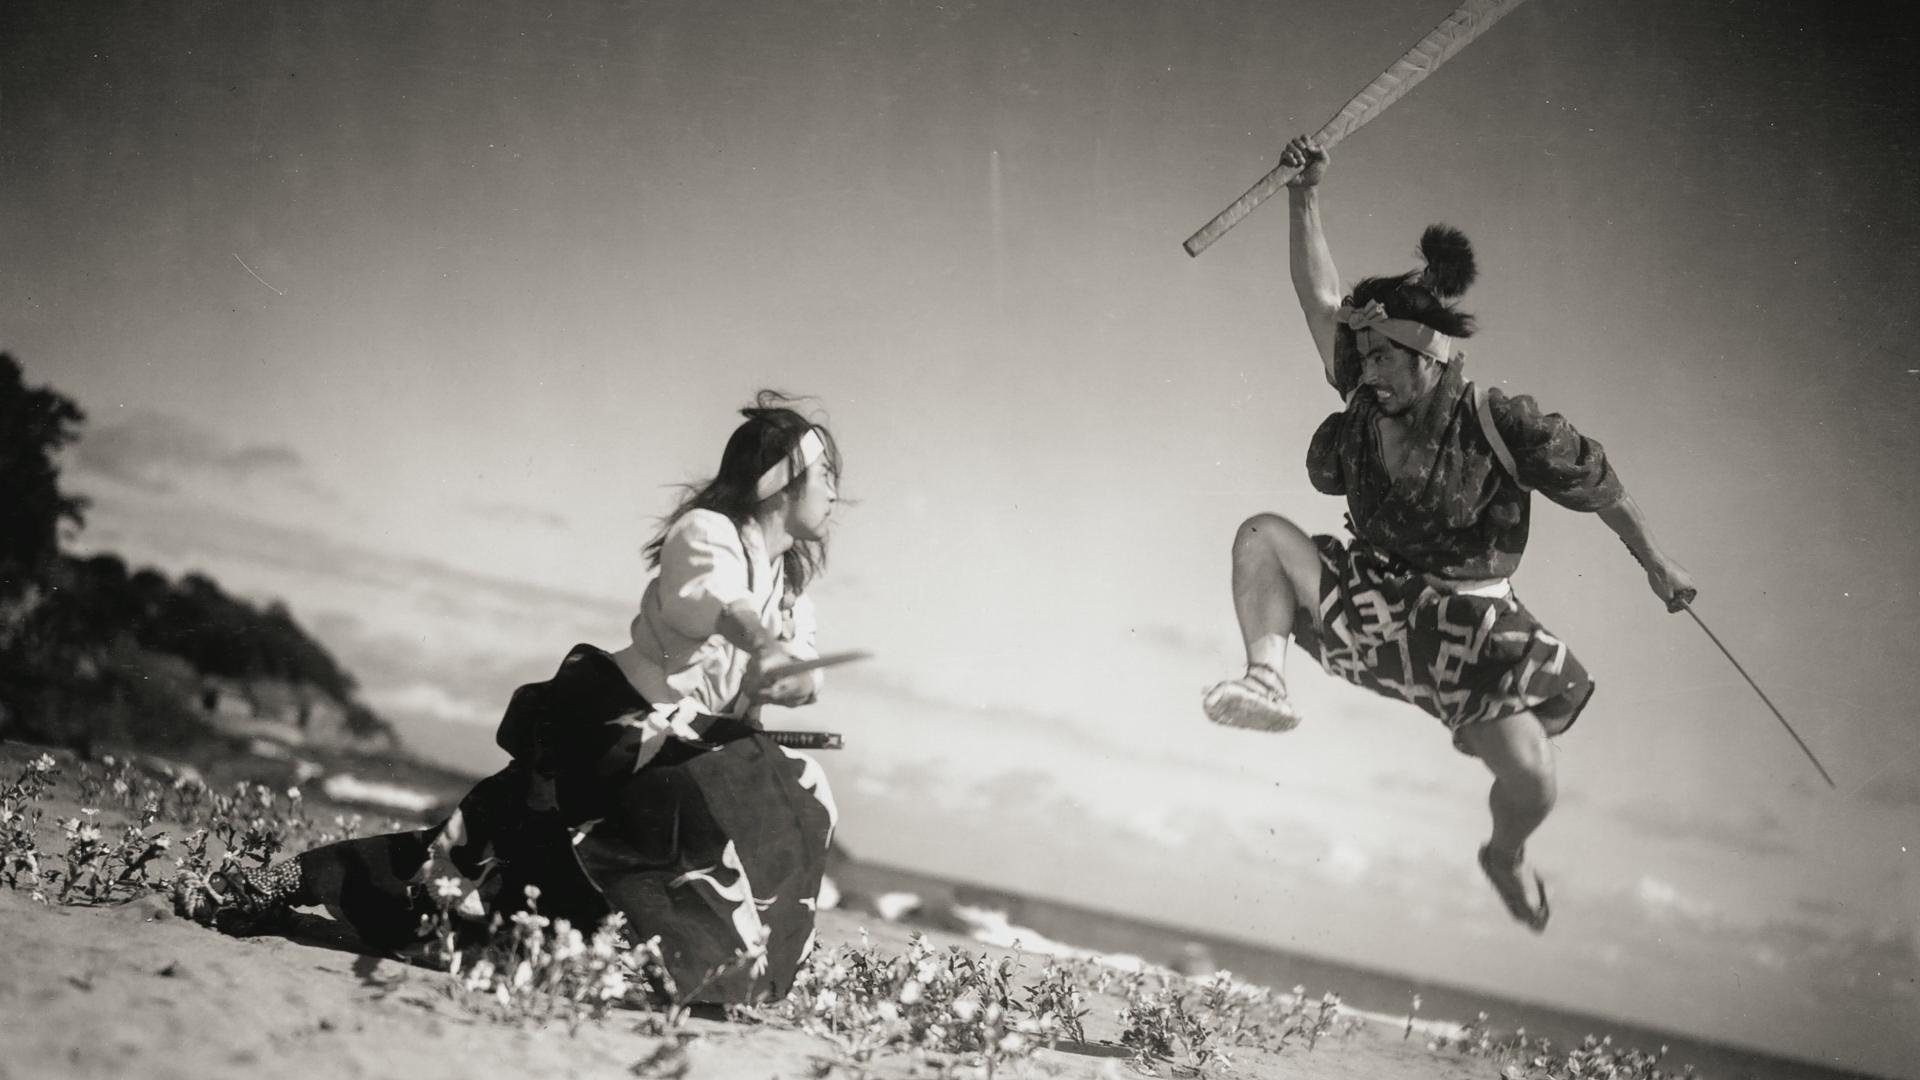 Toshiro Mifune Samurai III Duel at Ganryu Island (1956